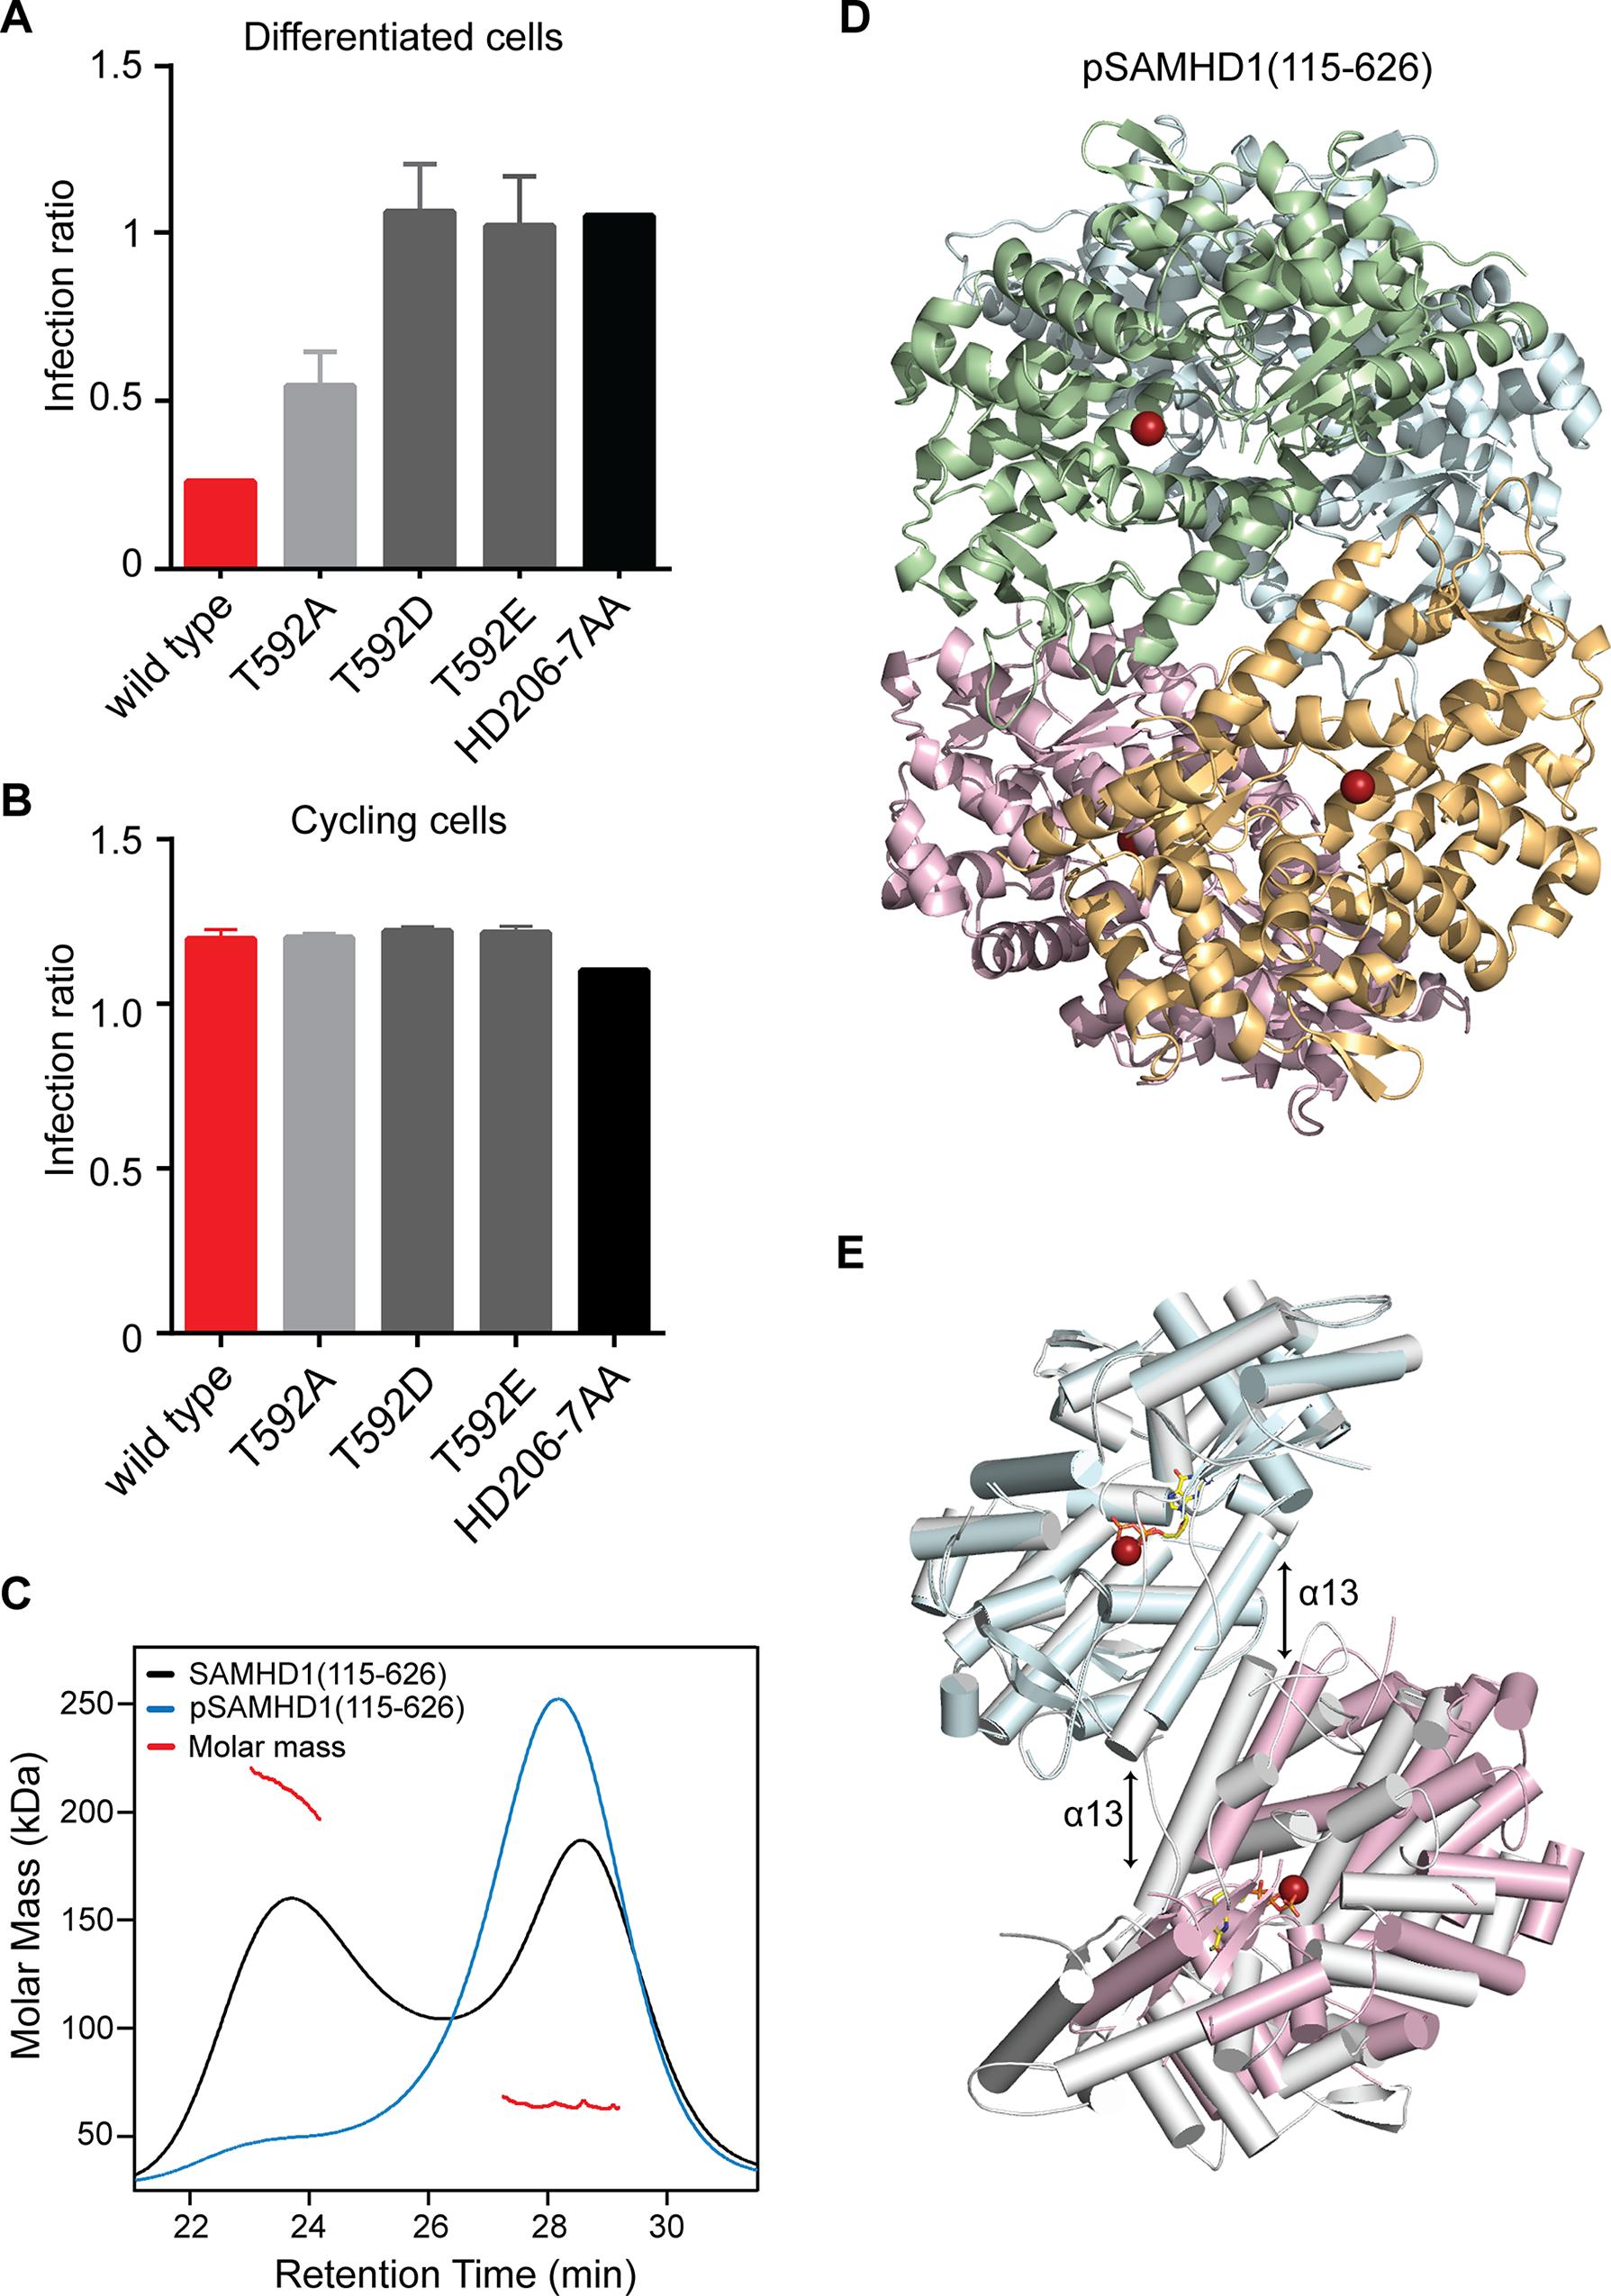 The effect of phosphorylation on SAMHD1 restriction and tetramerisation.